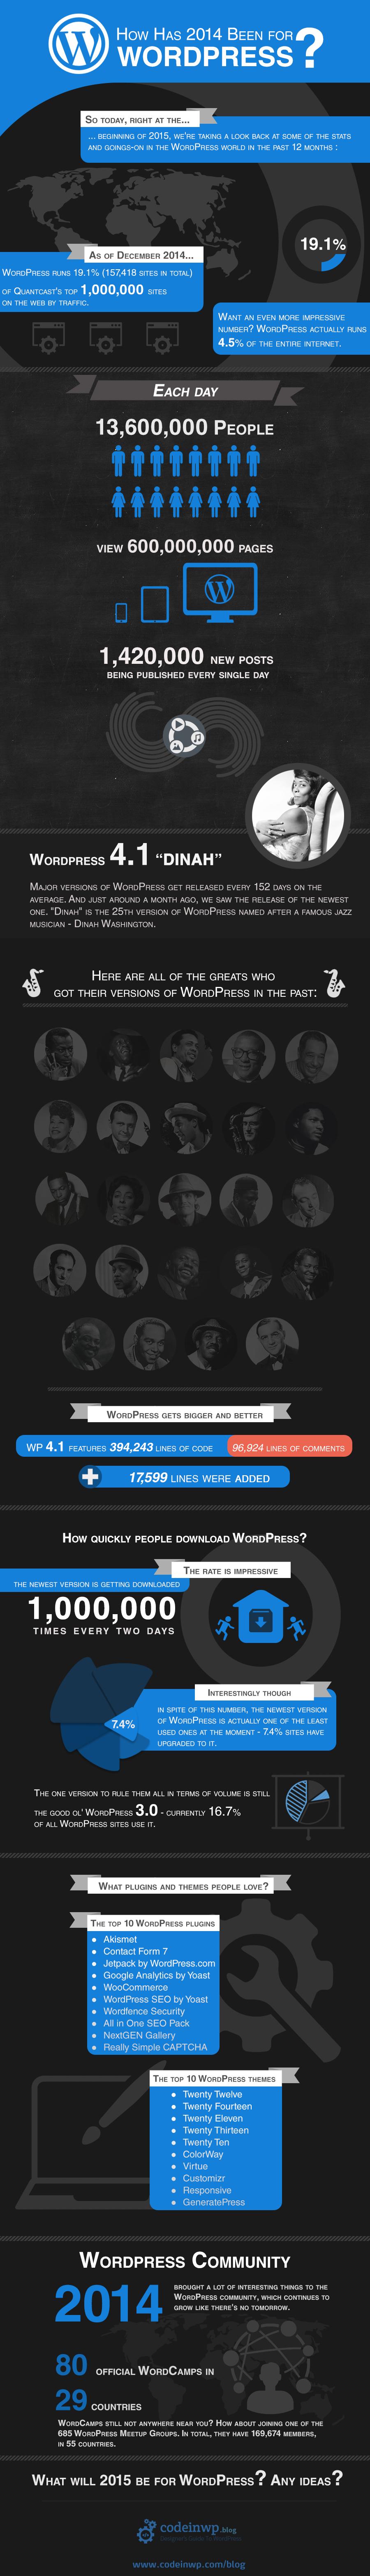 Growth of WordPress